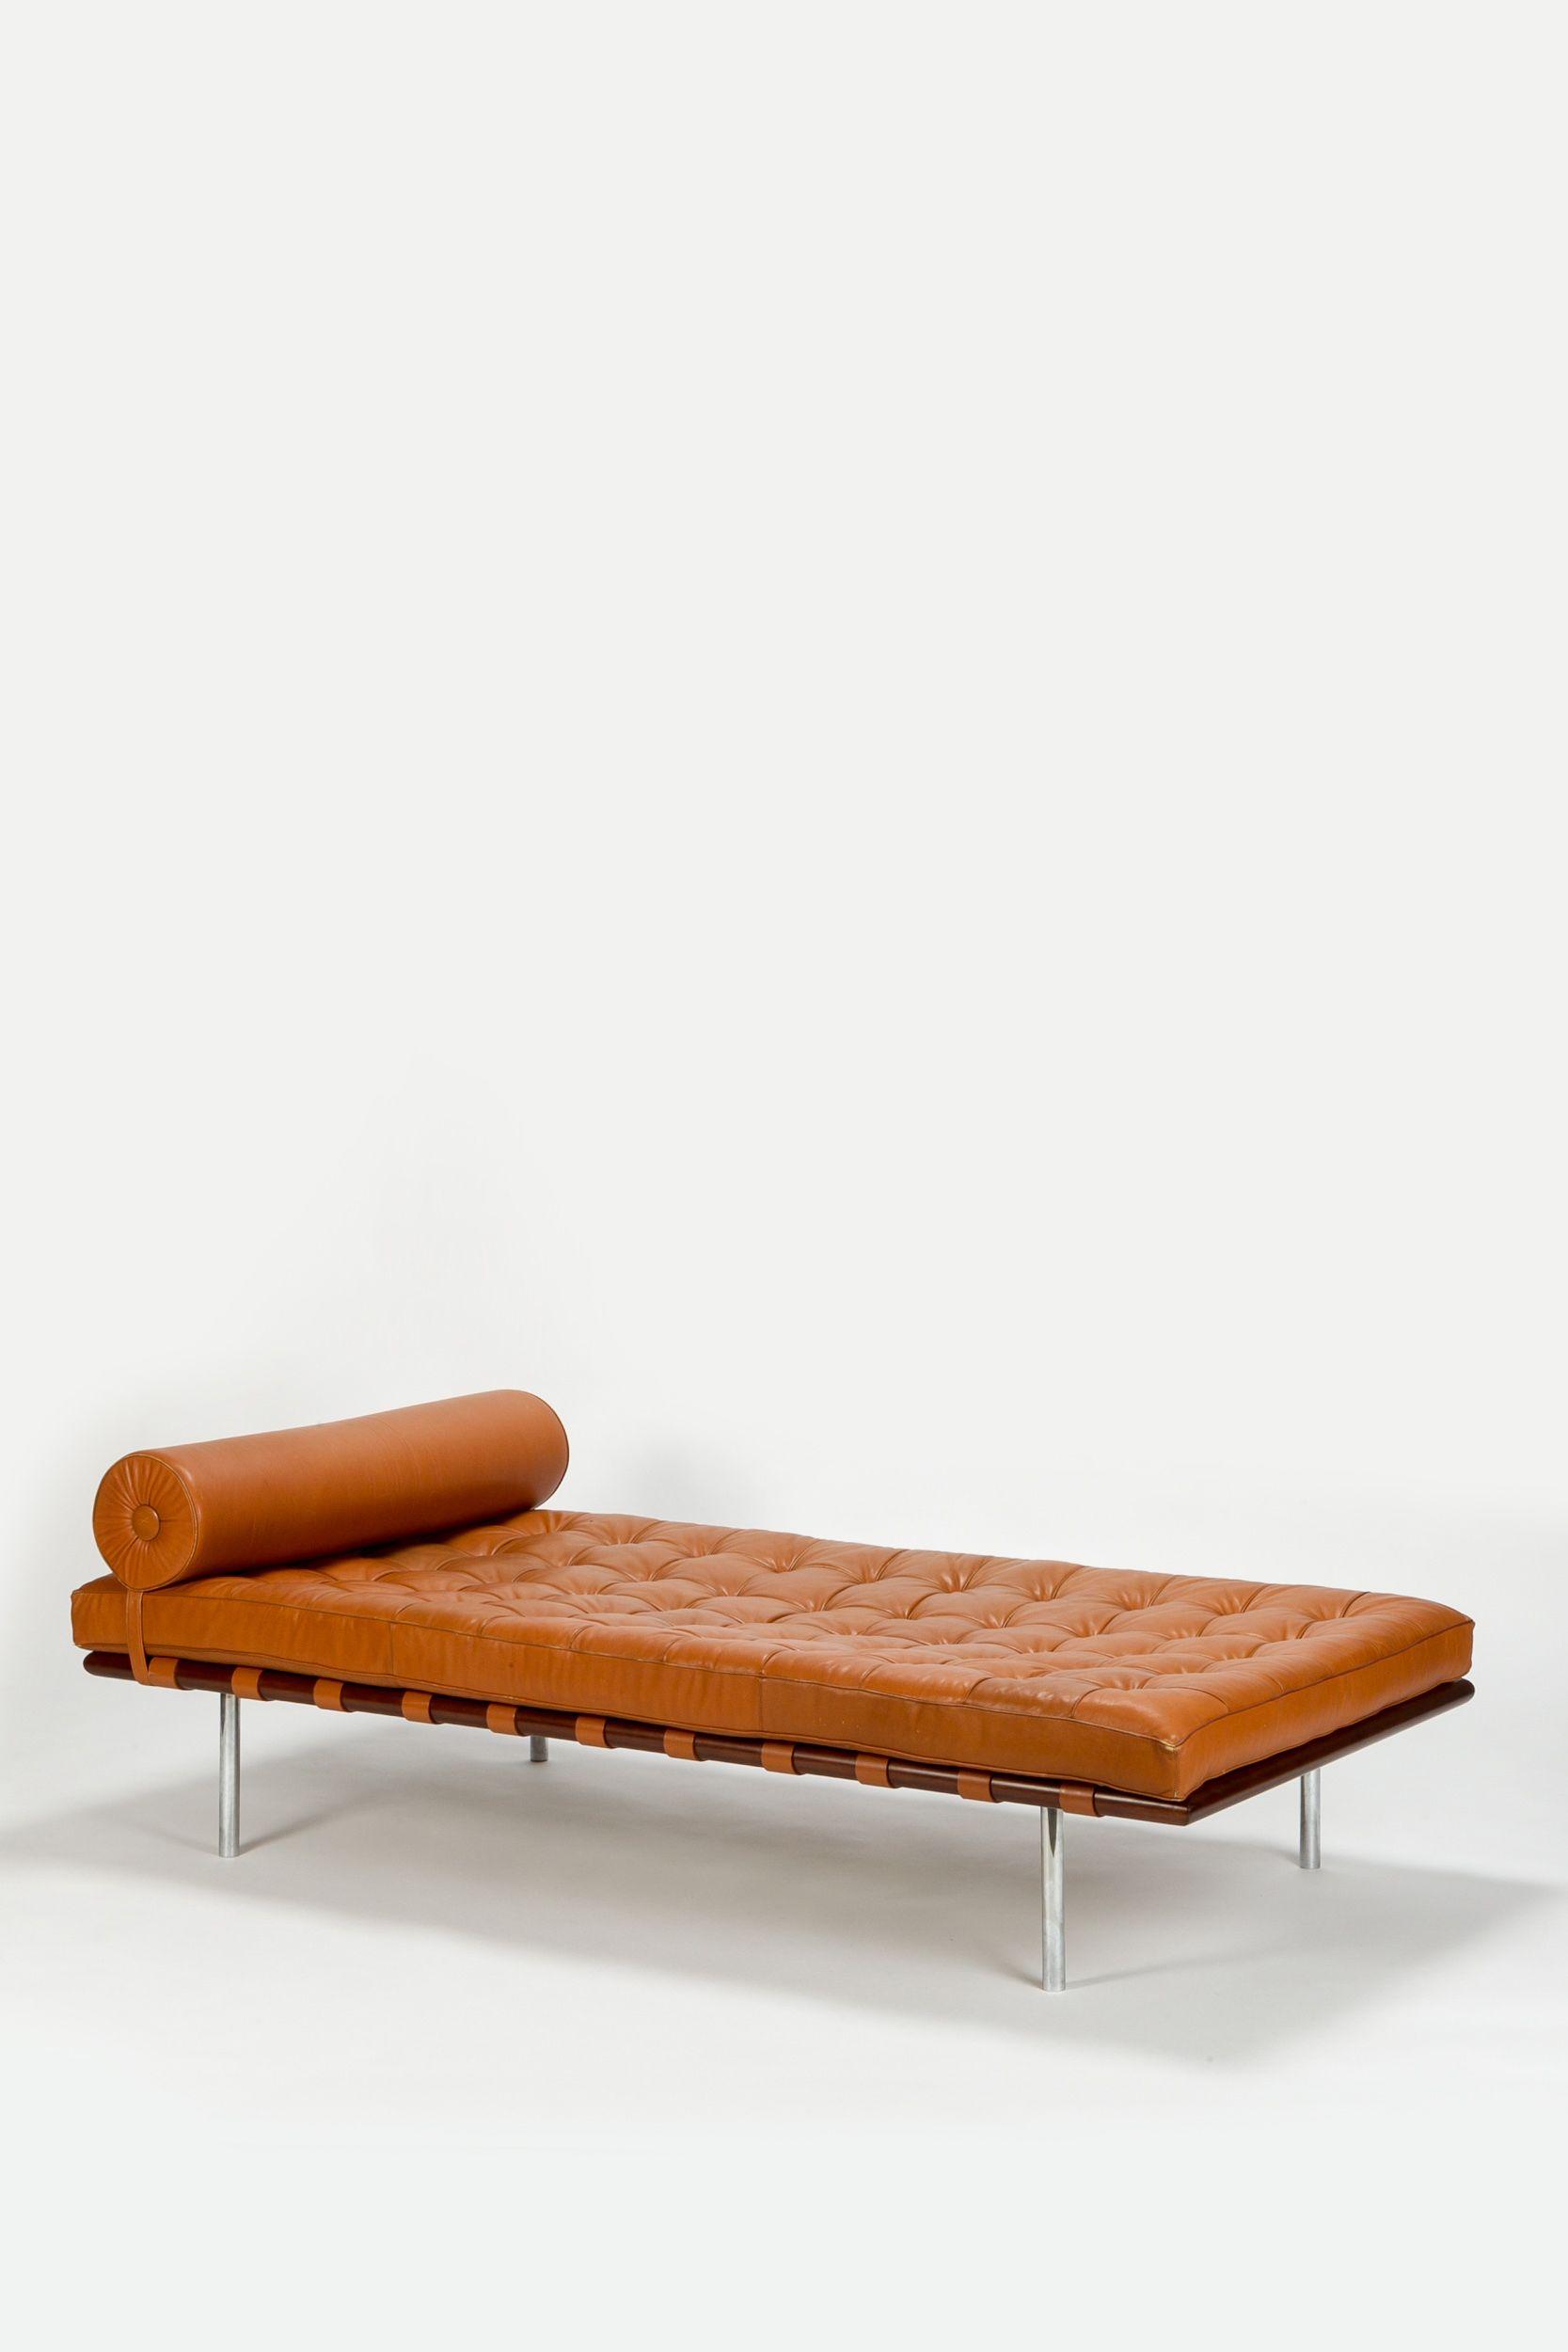 Bauhaus Sofas Cama Four Seater Sofa Uk Mies Van Der Rohe Barcelona Daybed Knoll